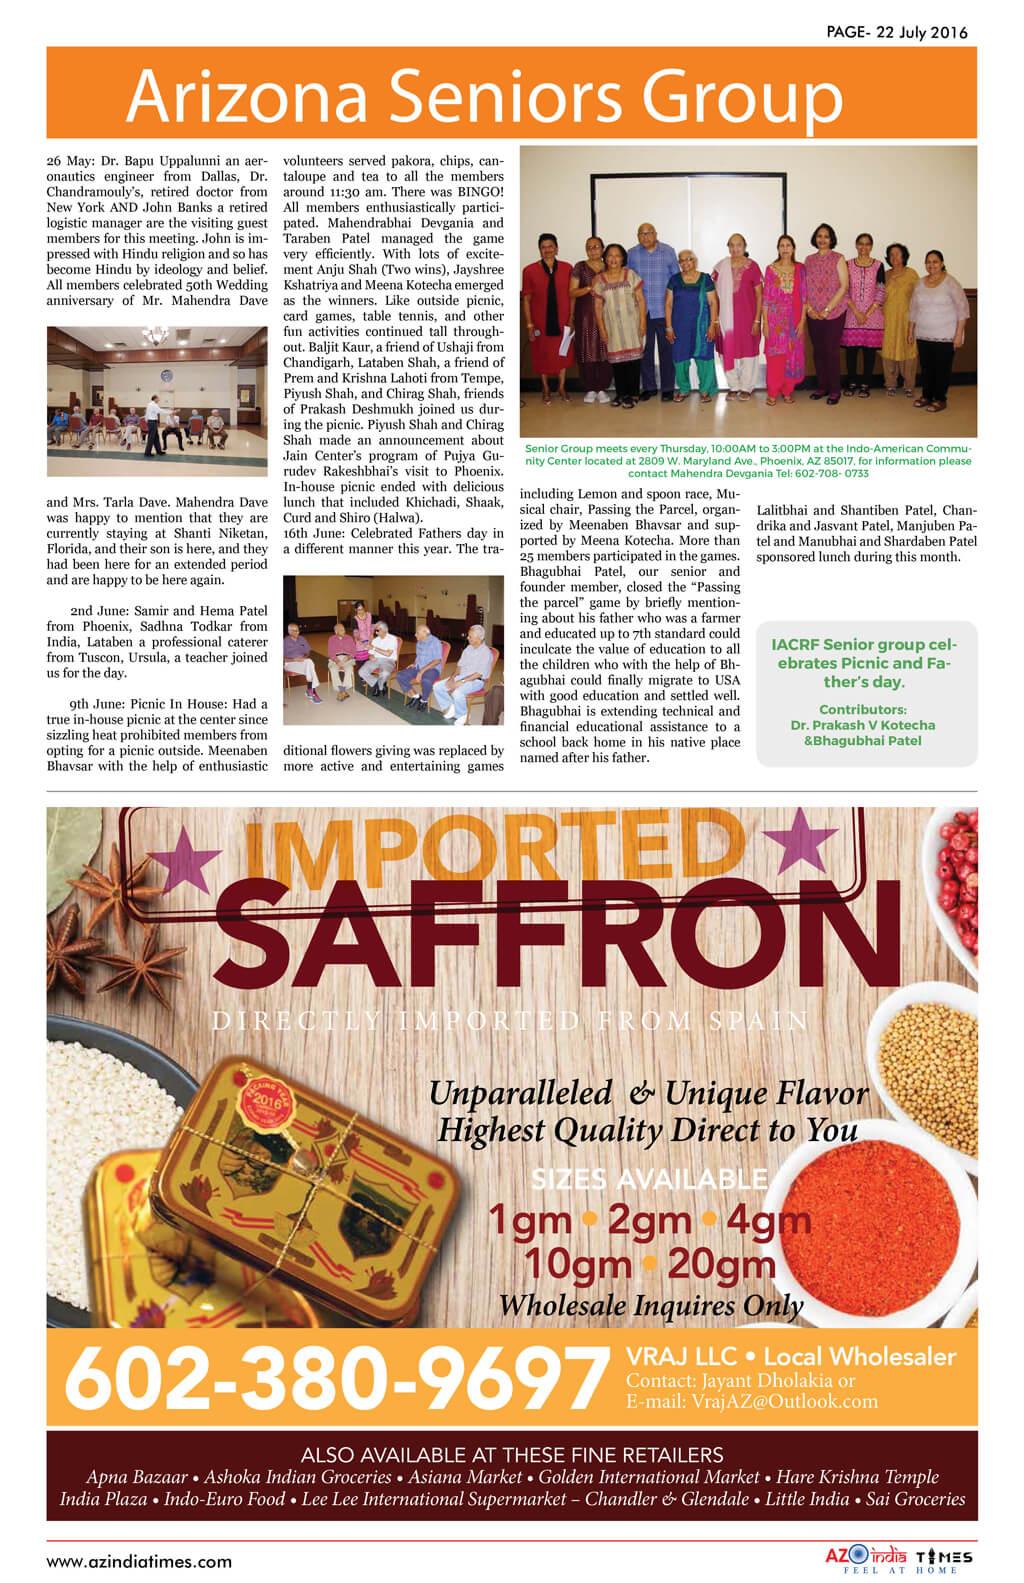 AZ INDIA NEWS PAGE-22